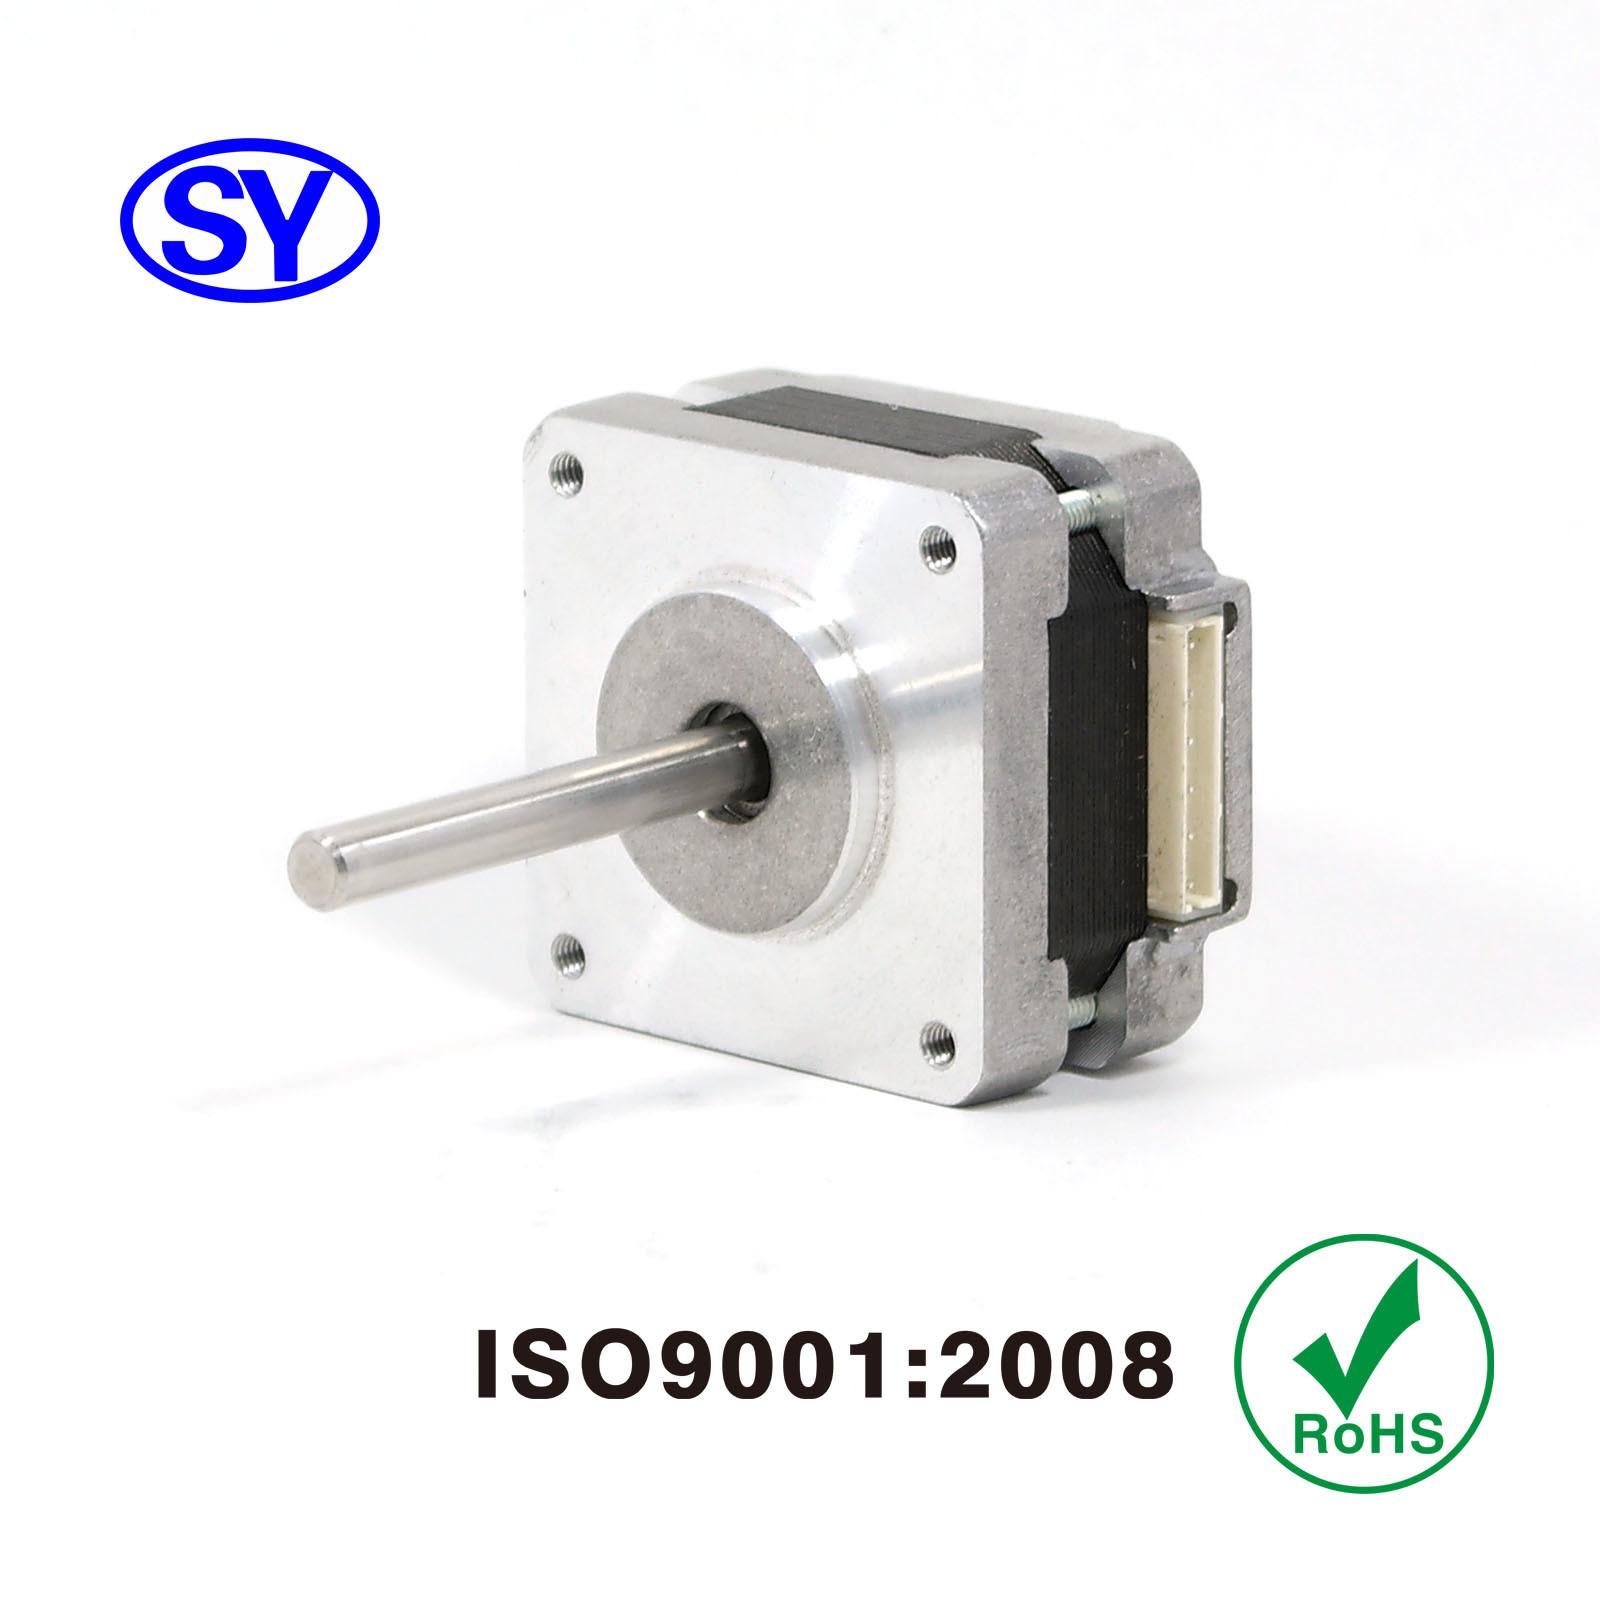 39 Mm (NEMA 16) 1.8 Degree Stepper Electrical Motor